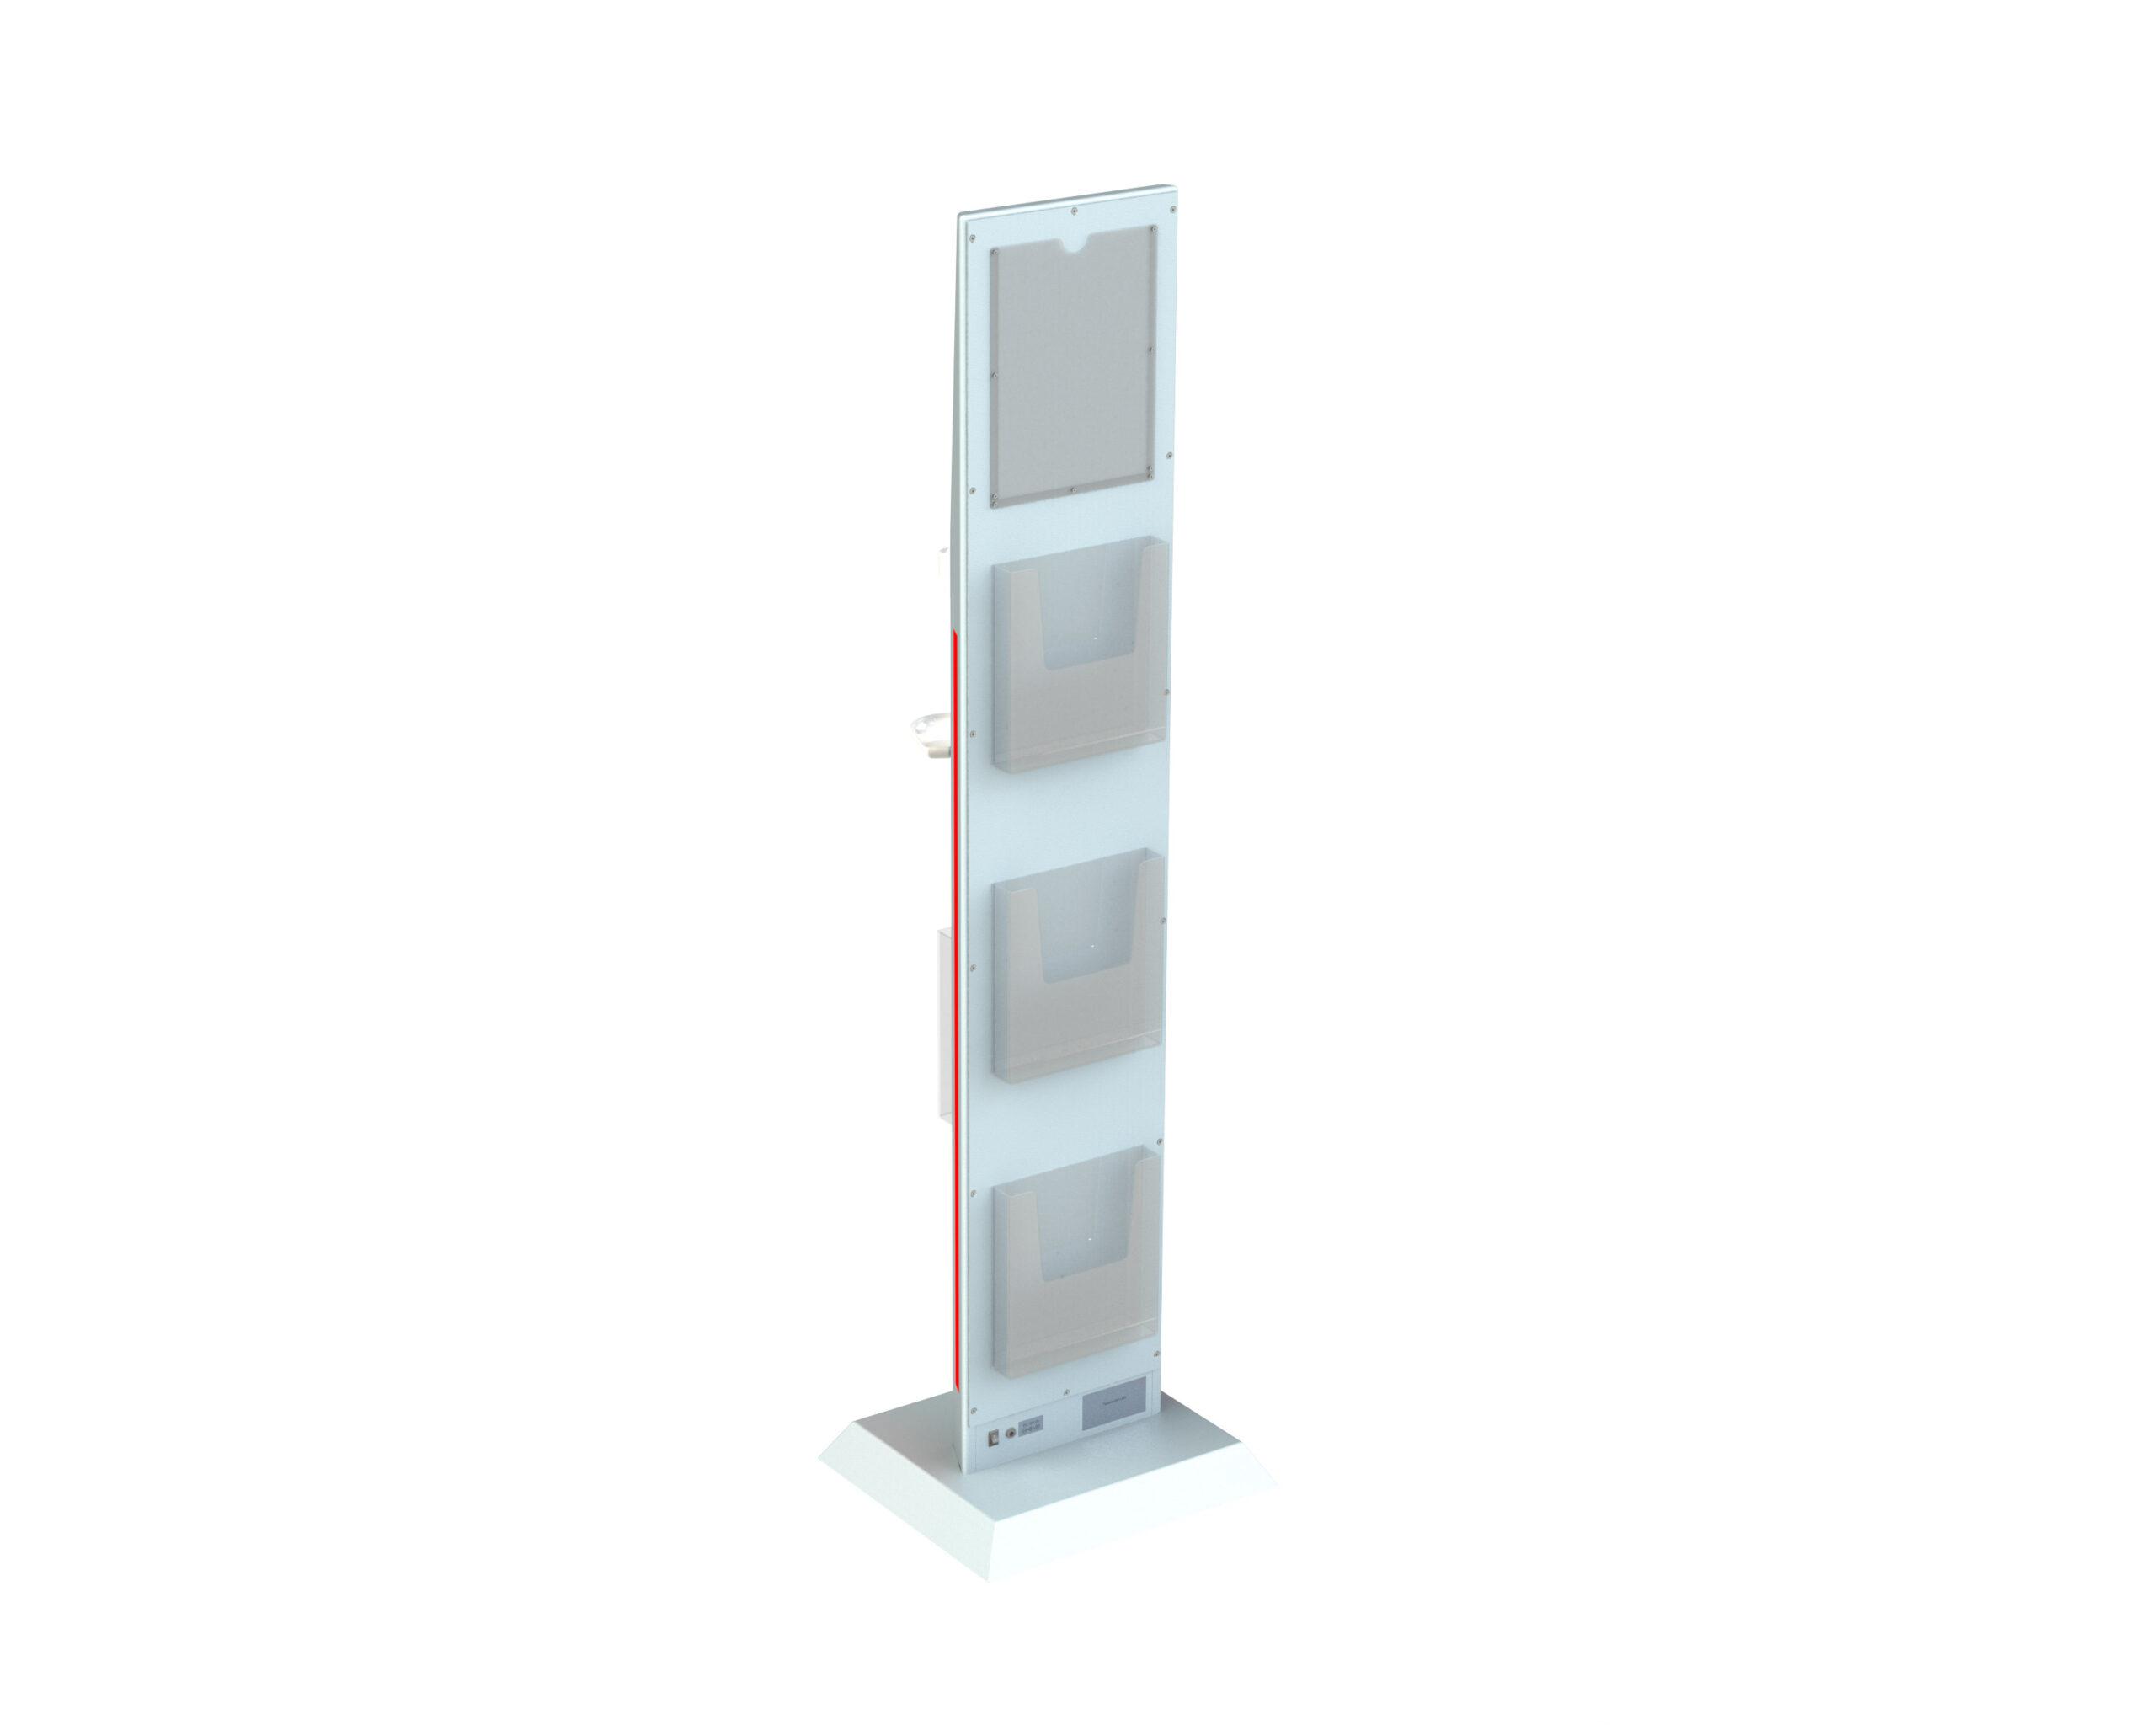 Hygienesaeule-Monolith-LED-4-Prospekthalter-hinten